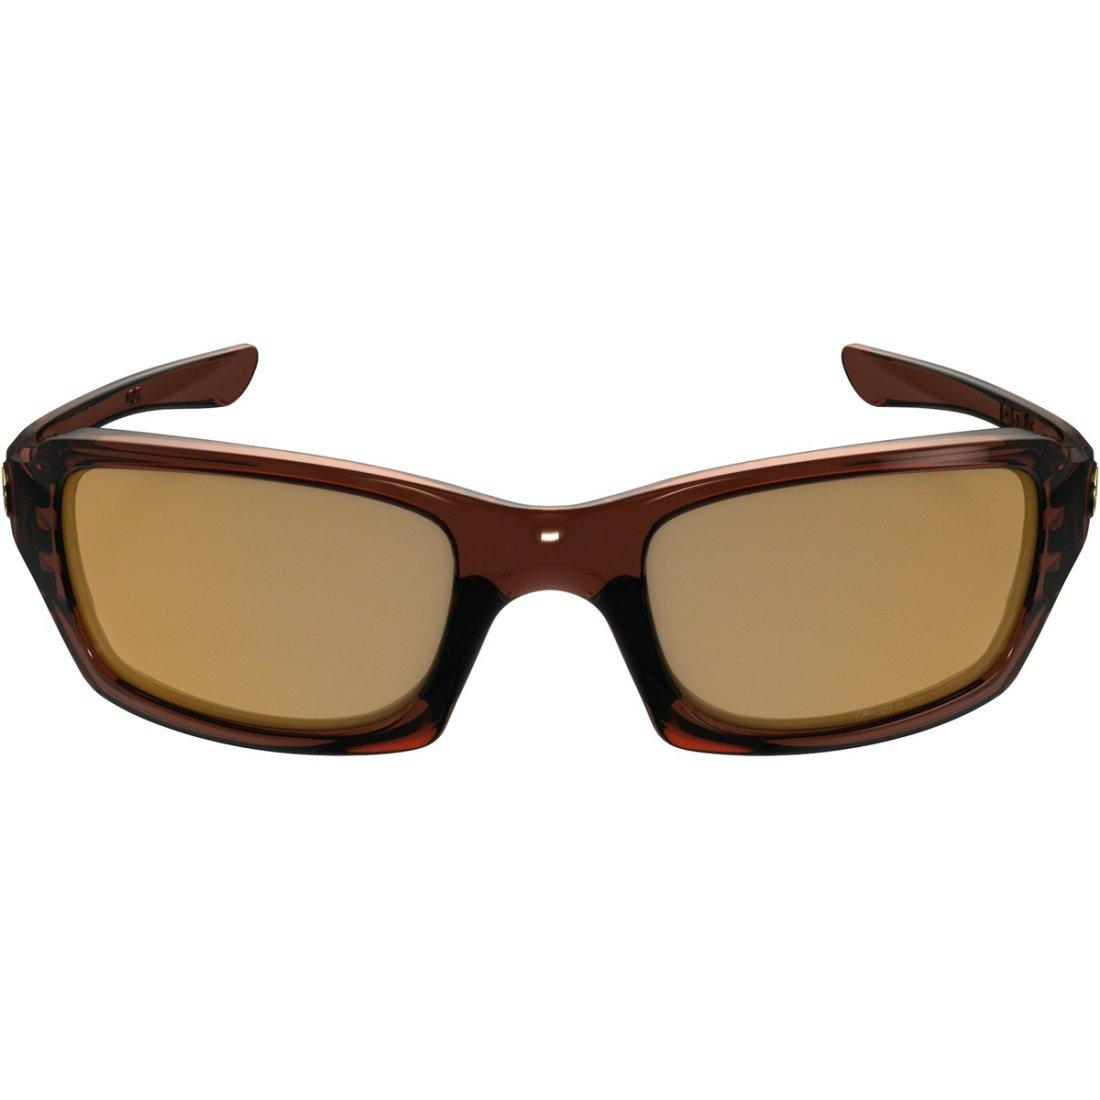 8f243ba5cf Gafas de sol OAKLEY Fives Squared Polished Root Beer   Bronze Polarized